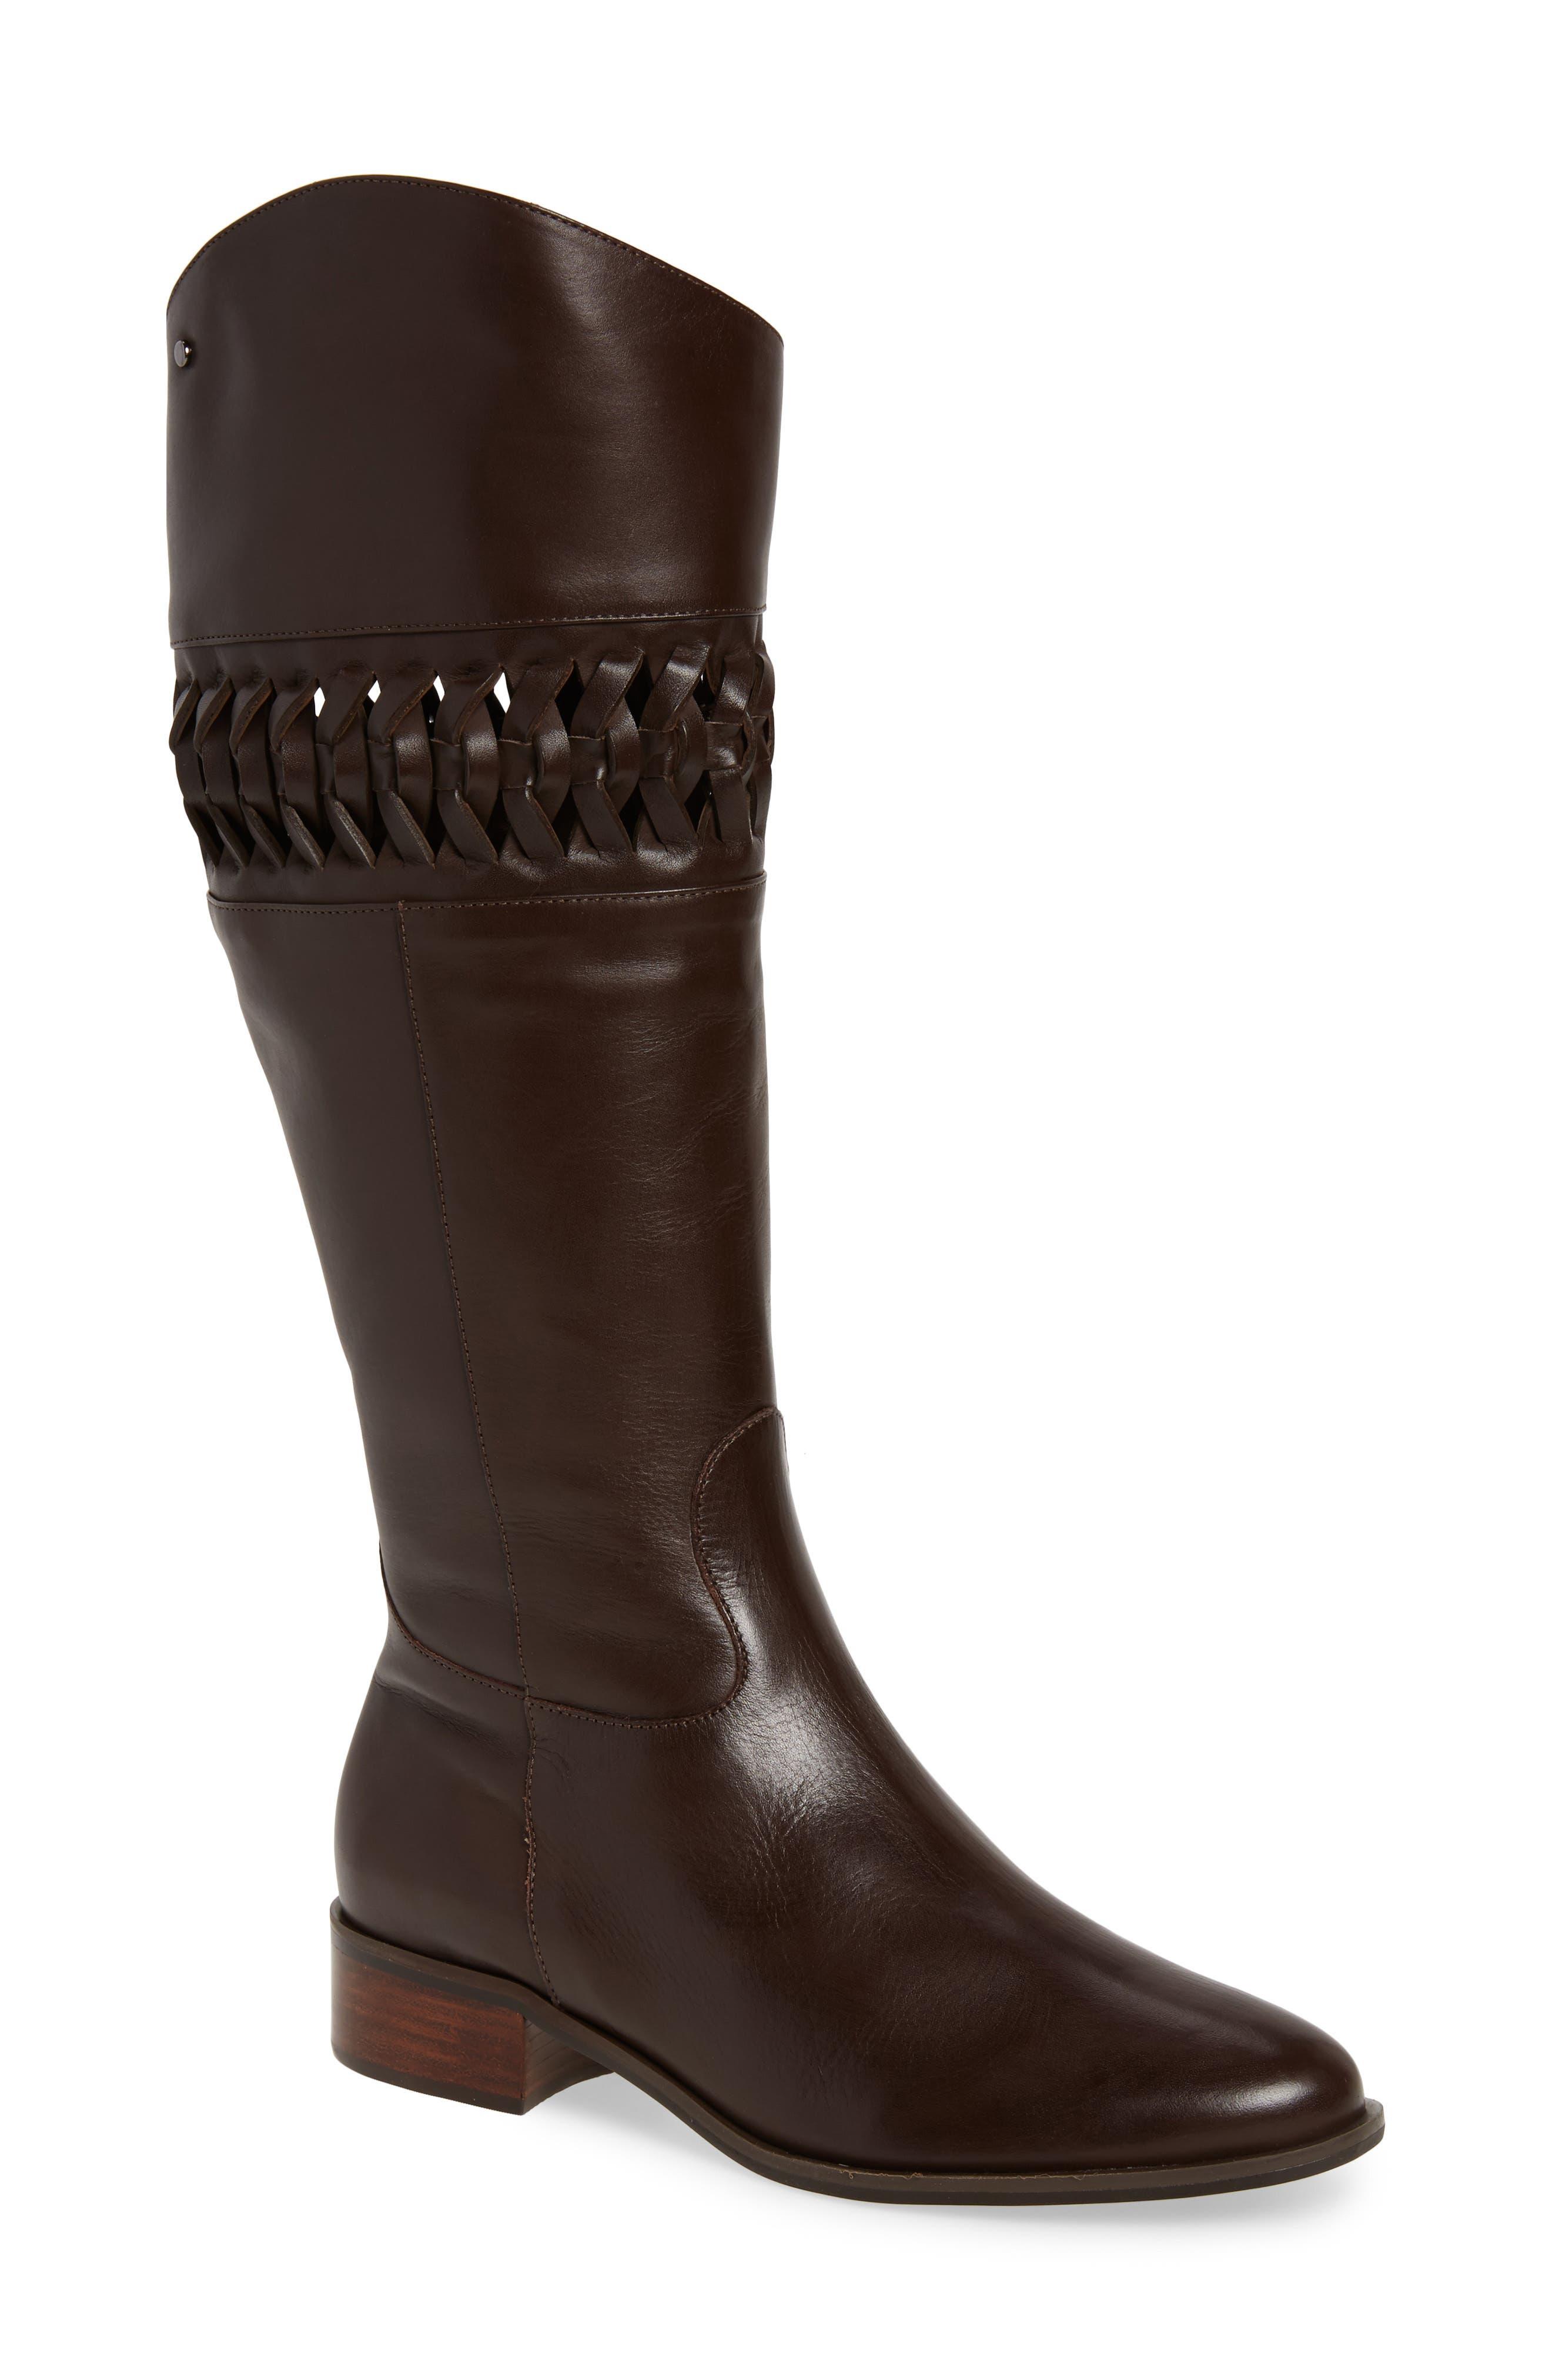 Zezette Woven Boot,                         Main,                         color, Cafe Leather